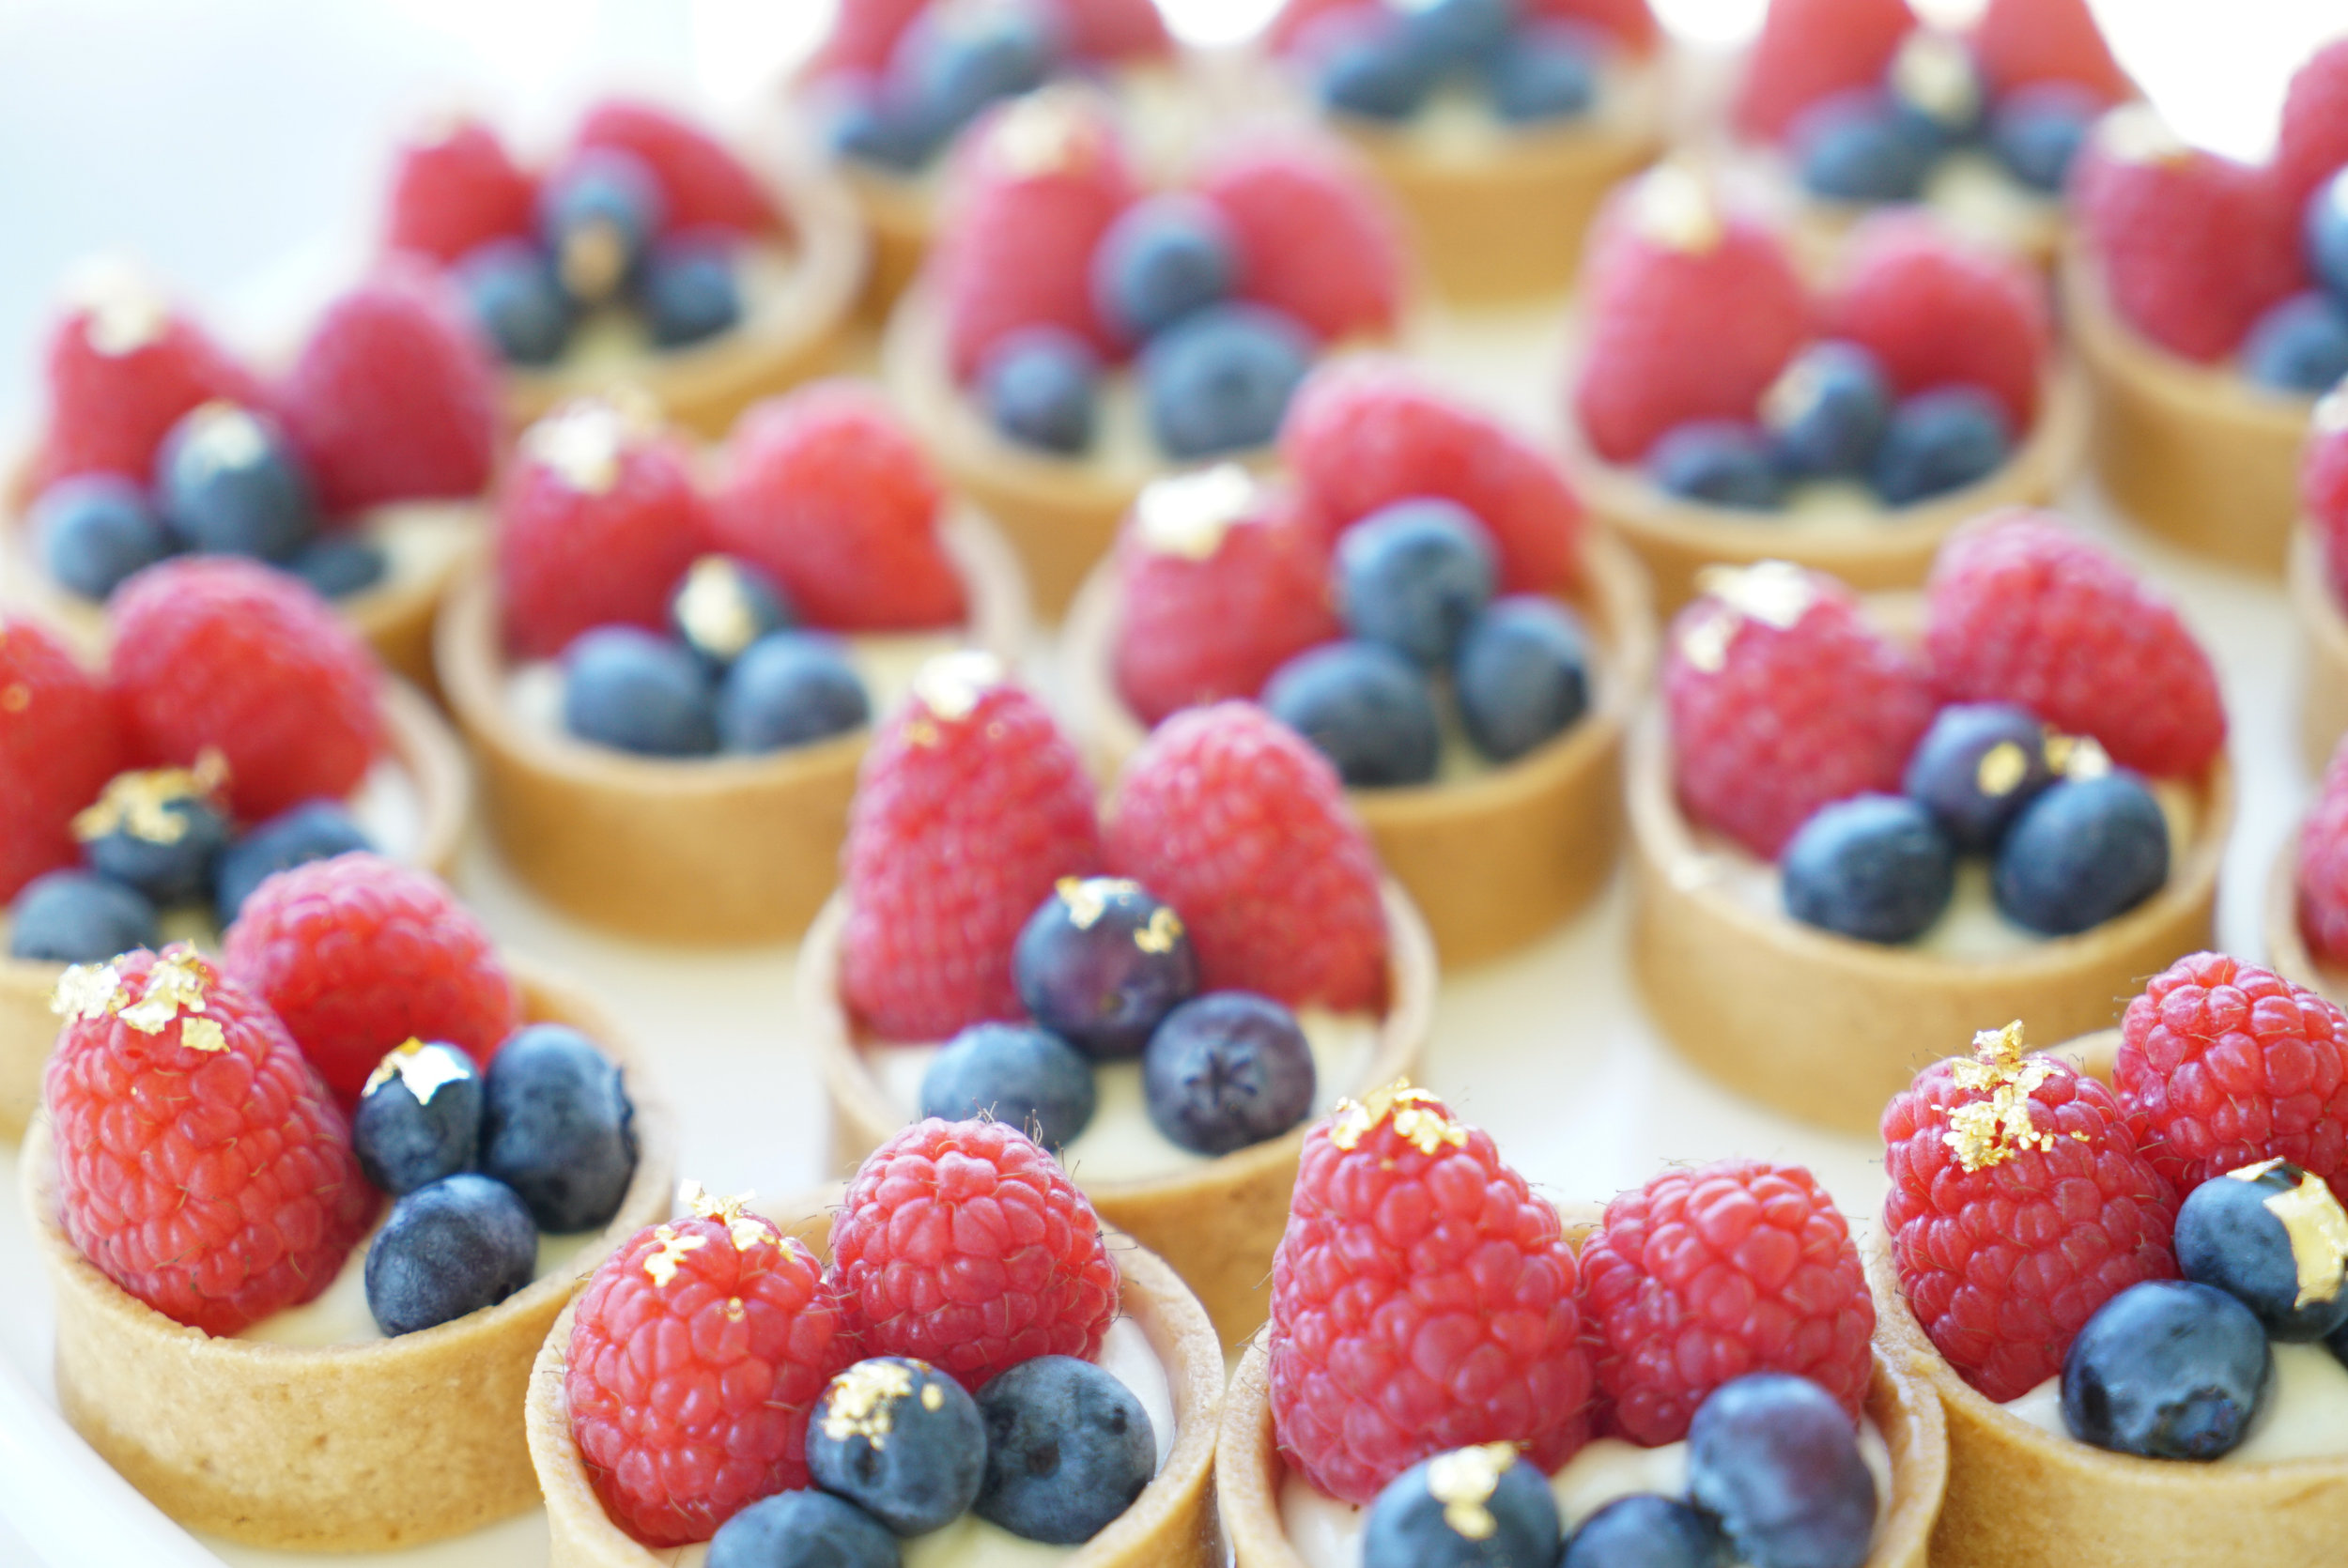 Hemsley 10.2.16 Minikhada Fruit Tart 2 (1 of 1).jpg